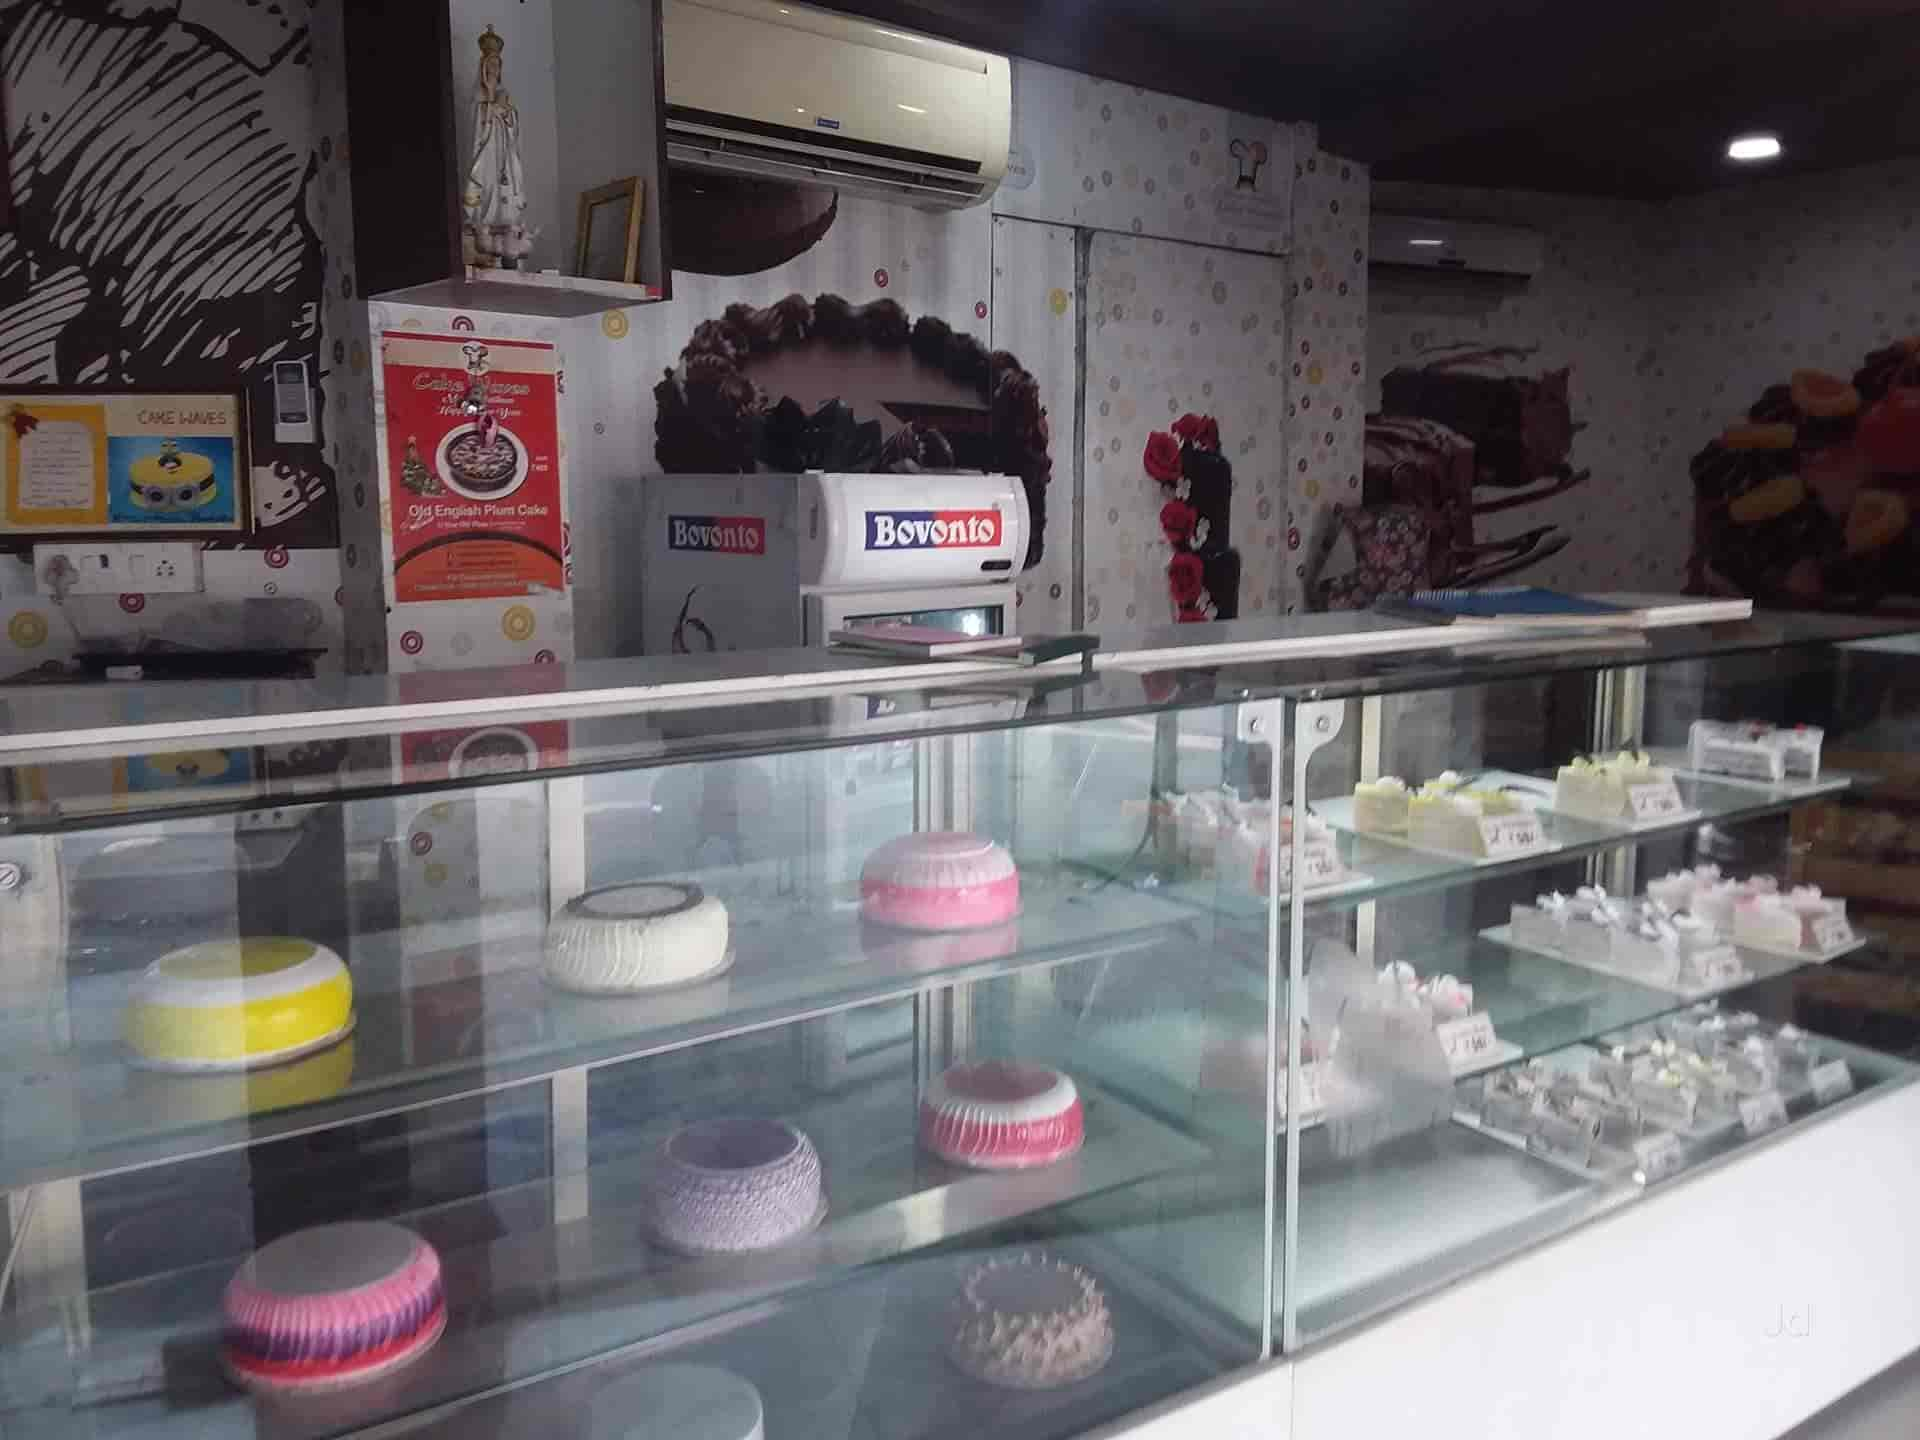 Cake Waves, Velacheri, Chennai - Bakeries, Fast Food, Desserts